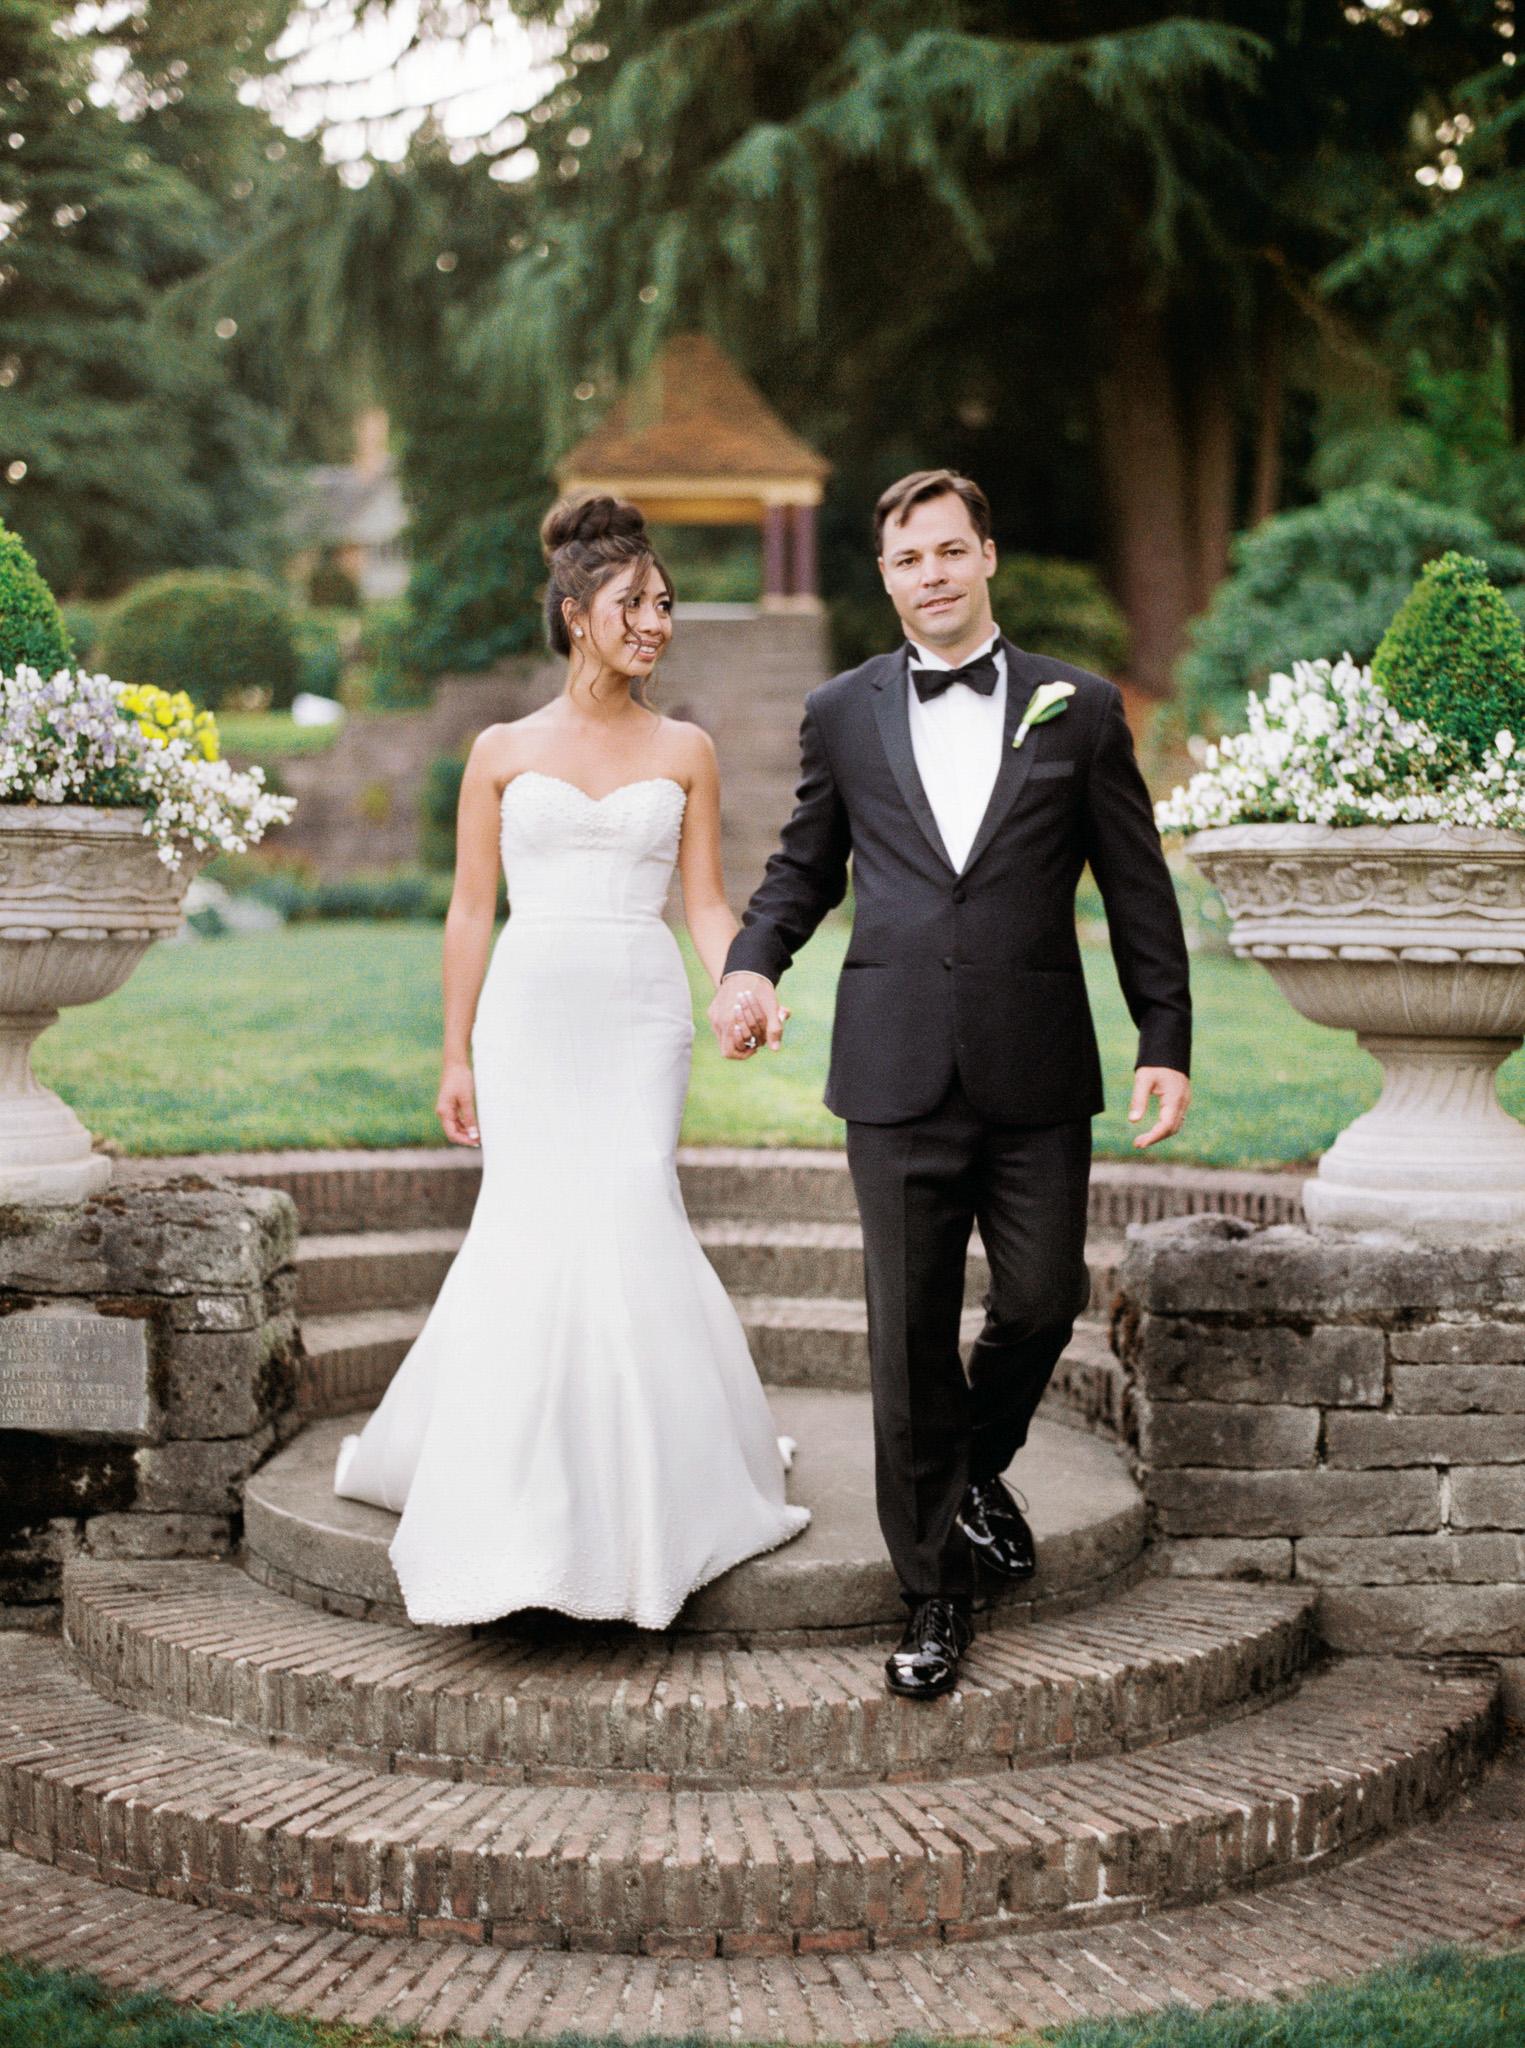 108OutliveCreative_Travel_Photographer_Videographer_Lewis&Clark_Oregon_Elegant_BlackTie_Destination_Wedding.jpg